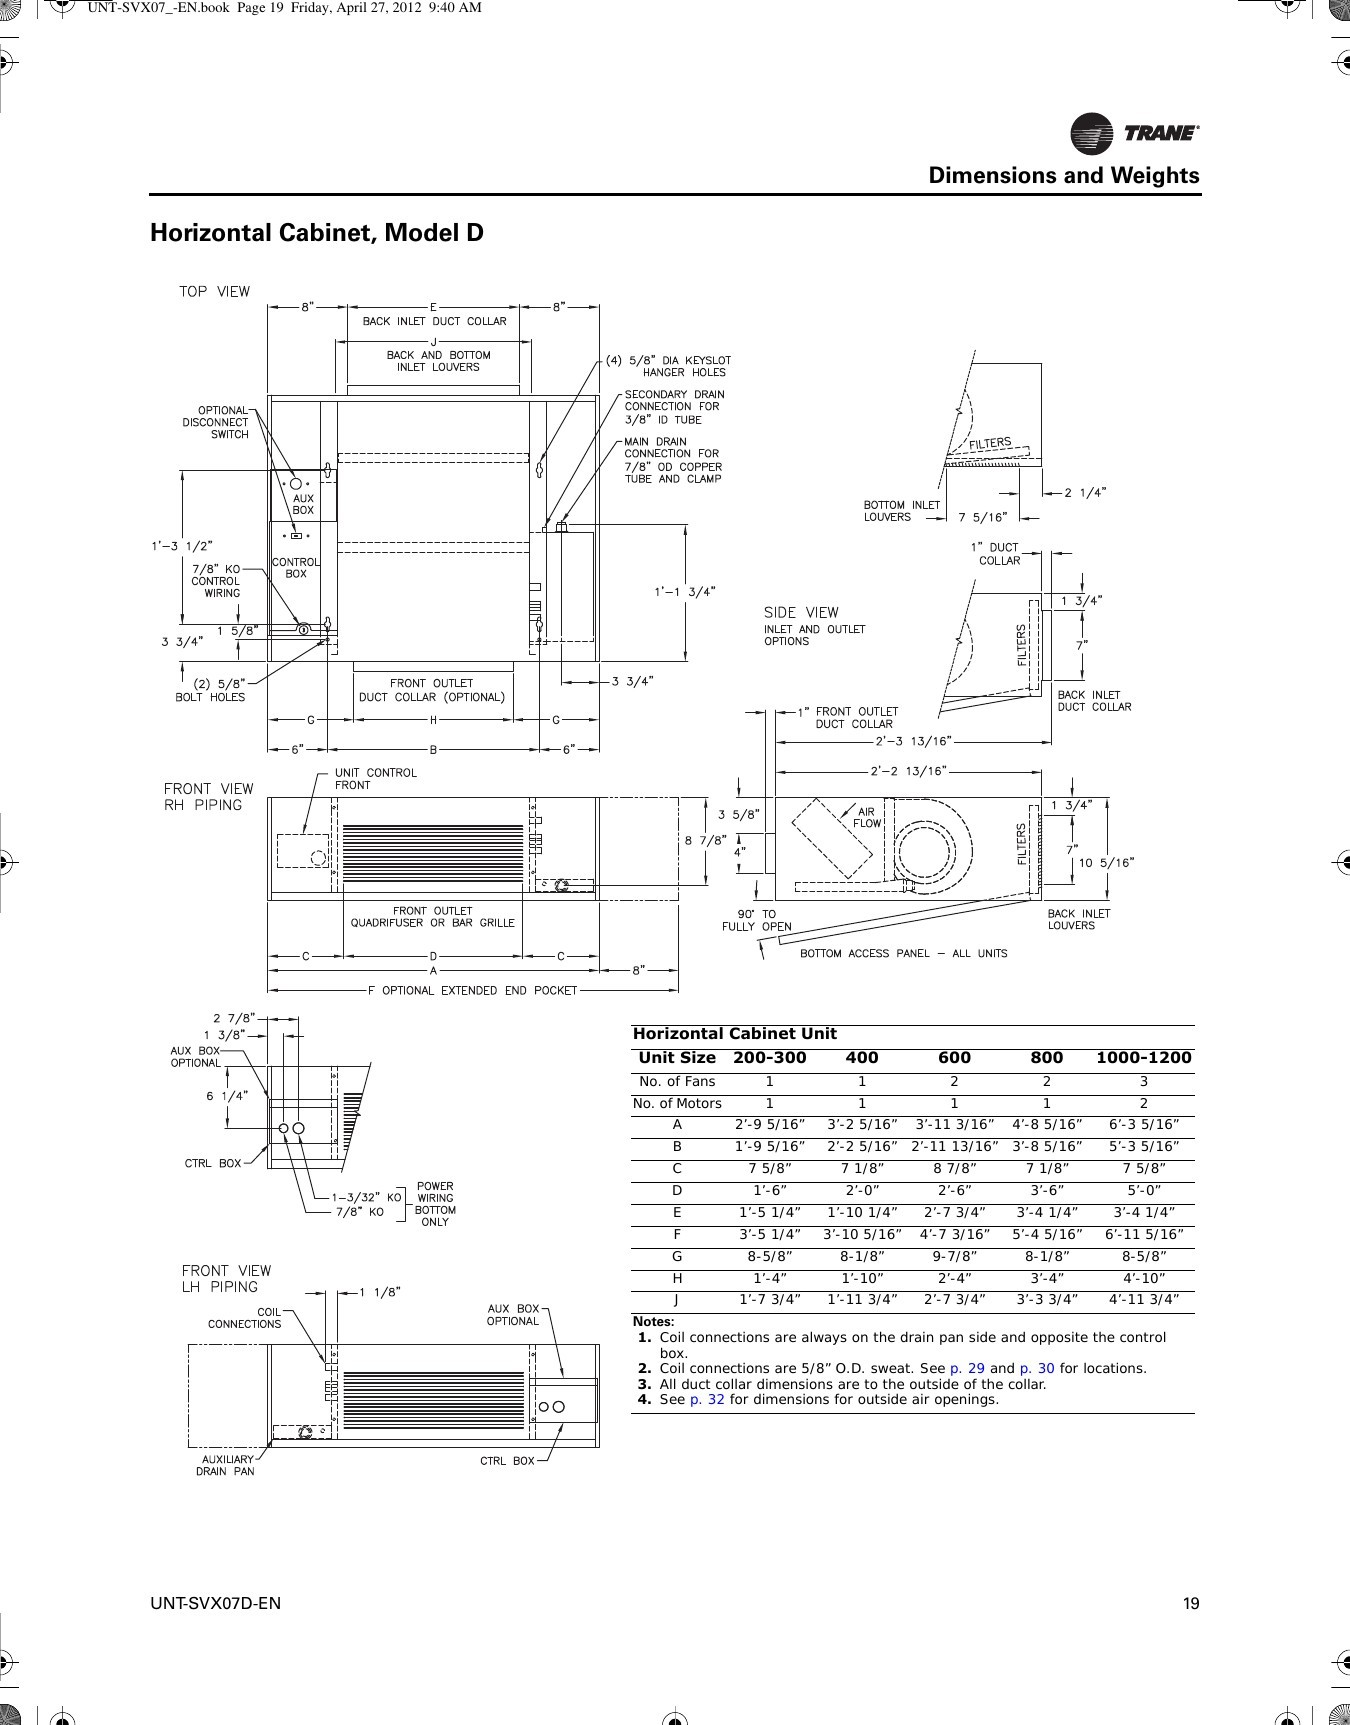 trane xe 1200 heat pump wiring diagram light switch wire image